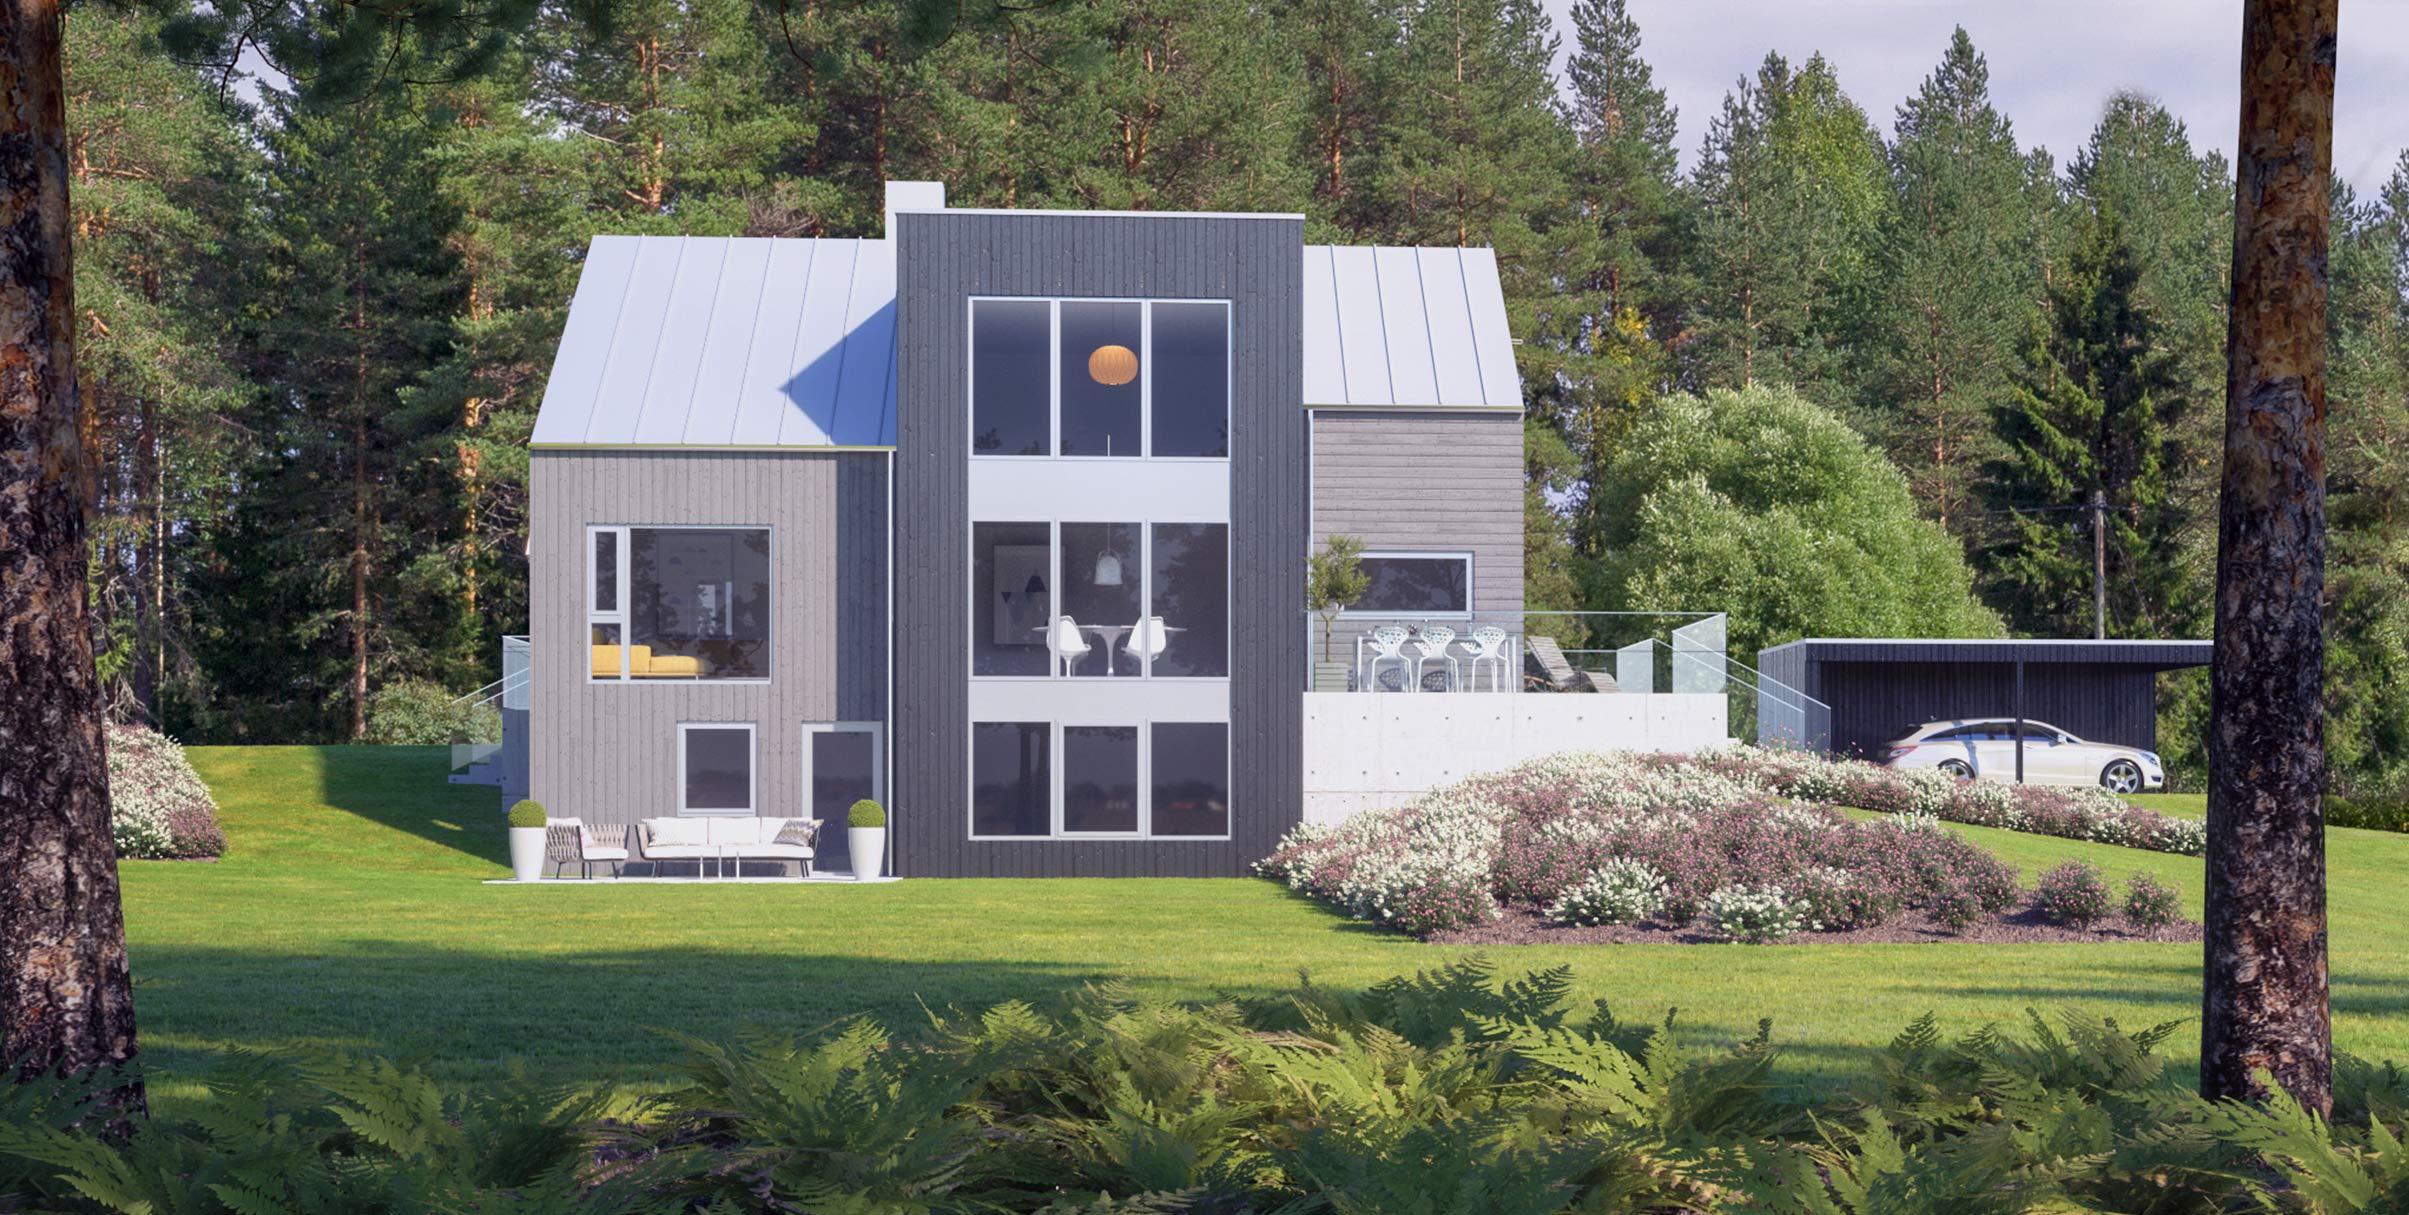 Nytt hus i skogen